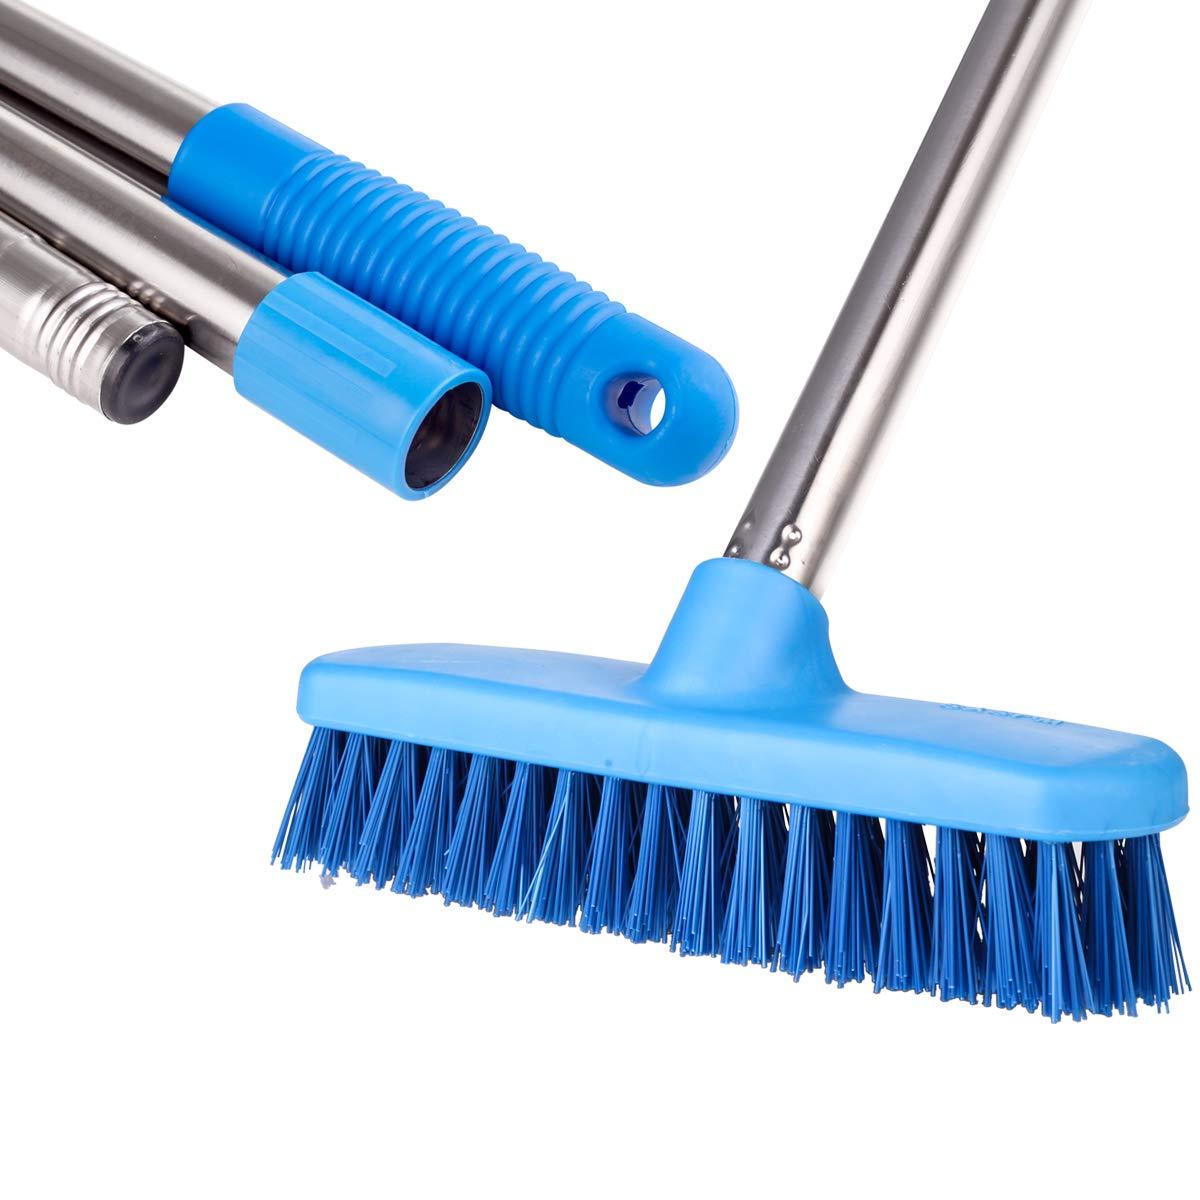 10 Weiler 44028 Deck Scrub Brush White Tampico Fill